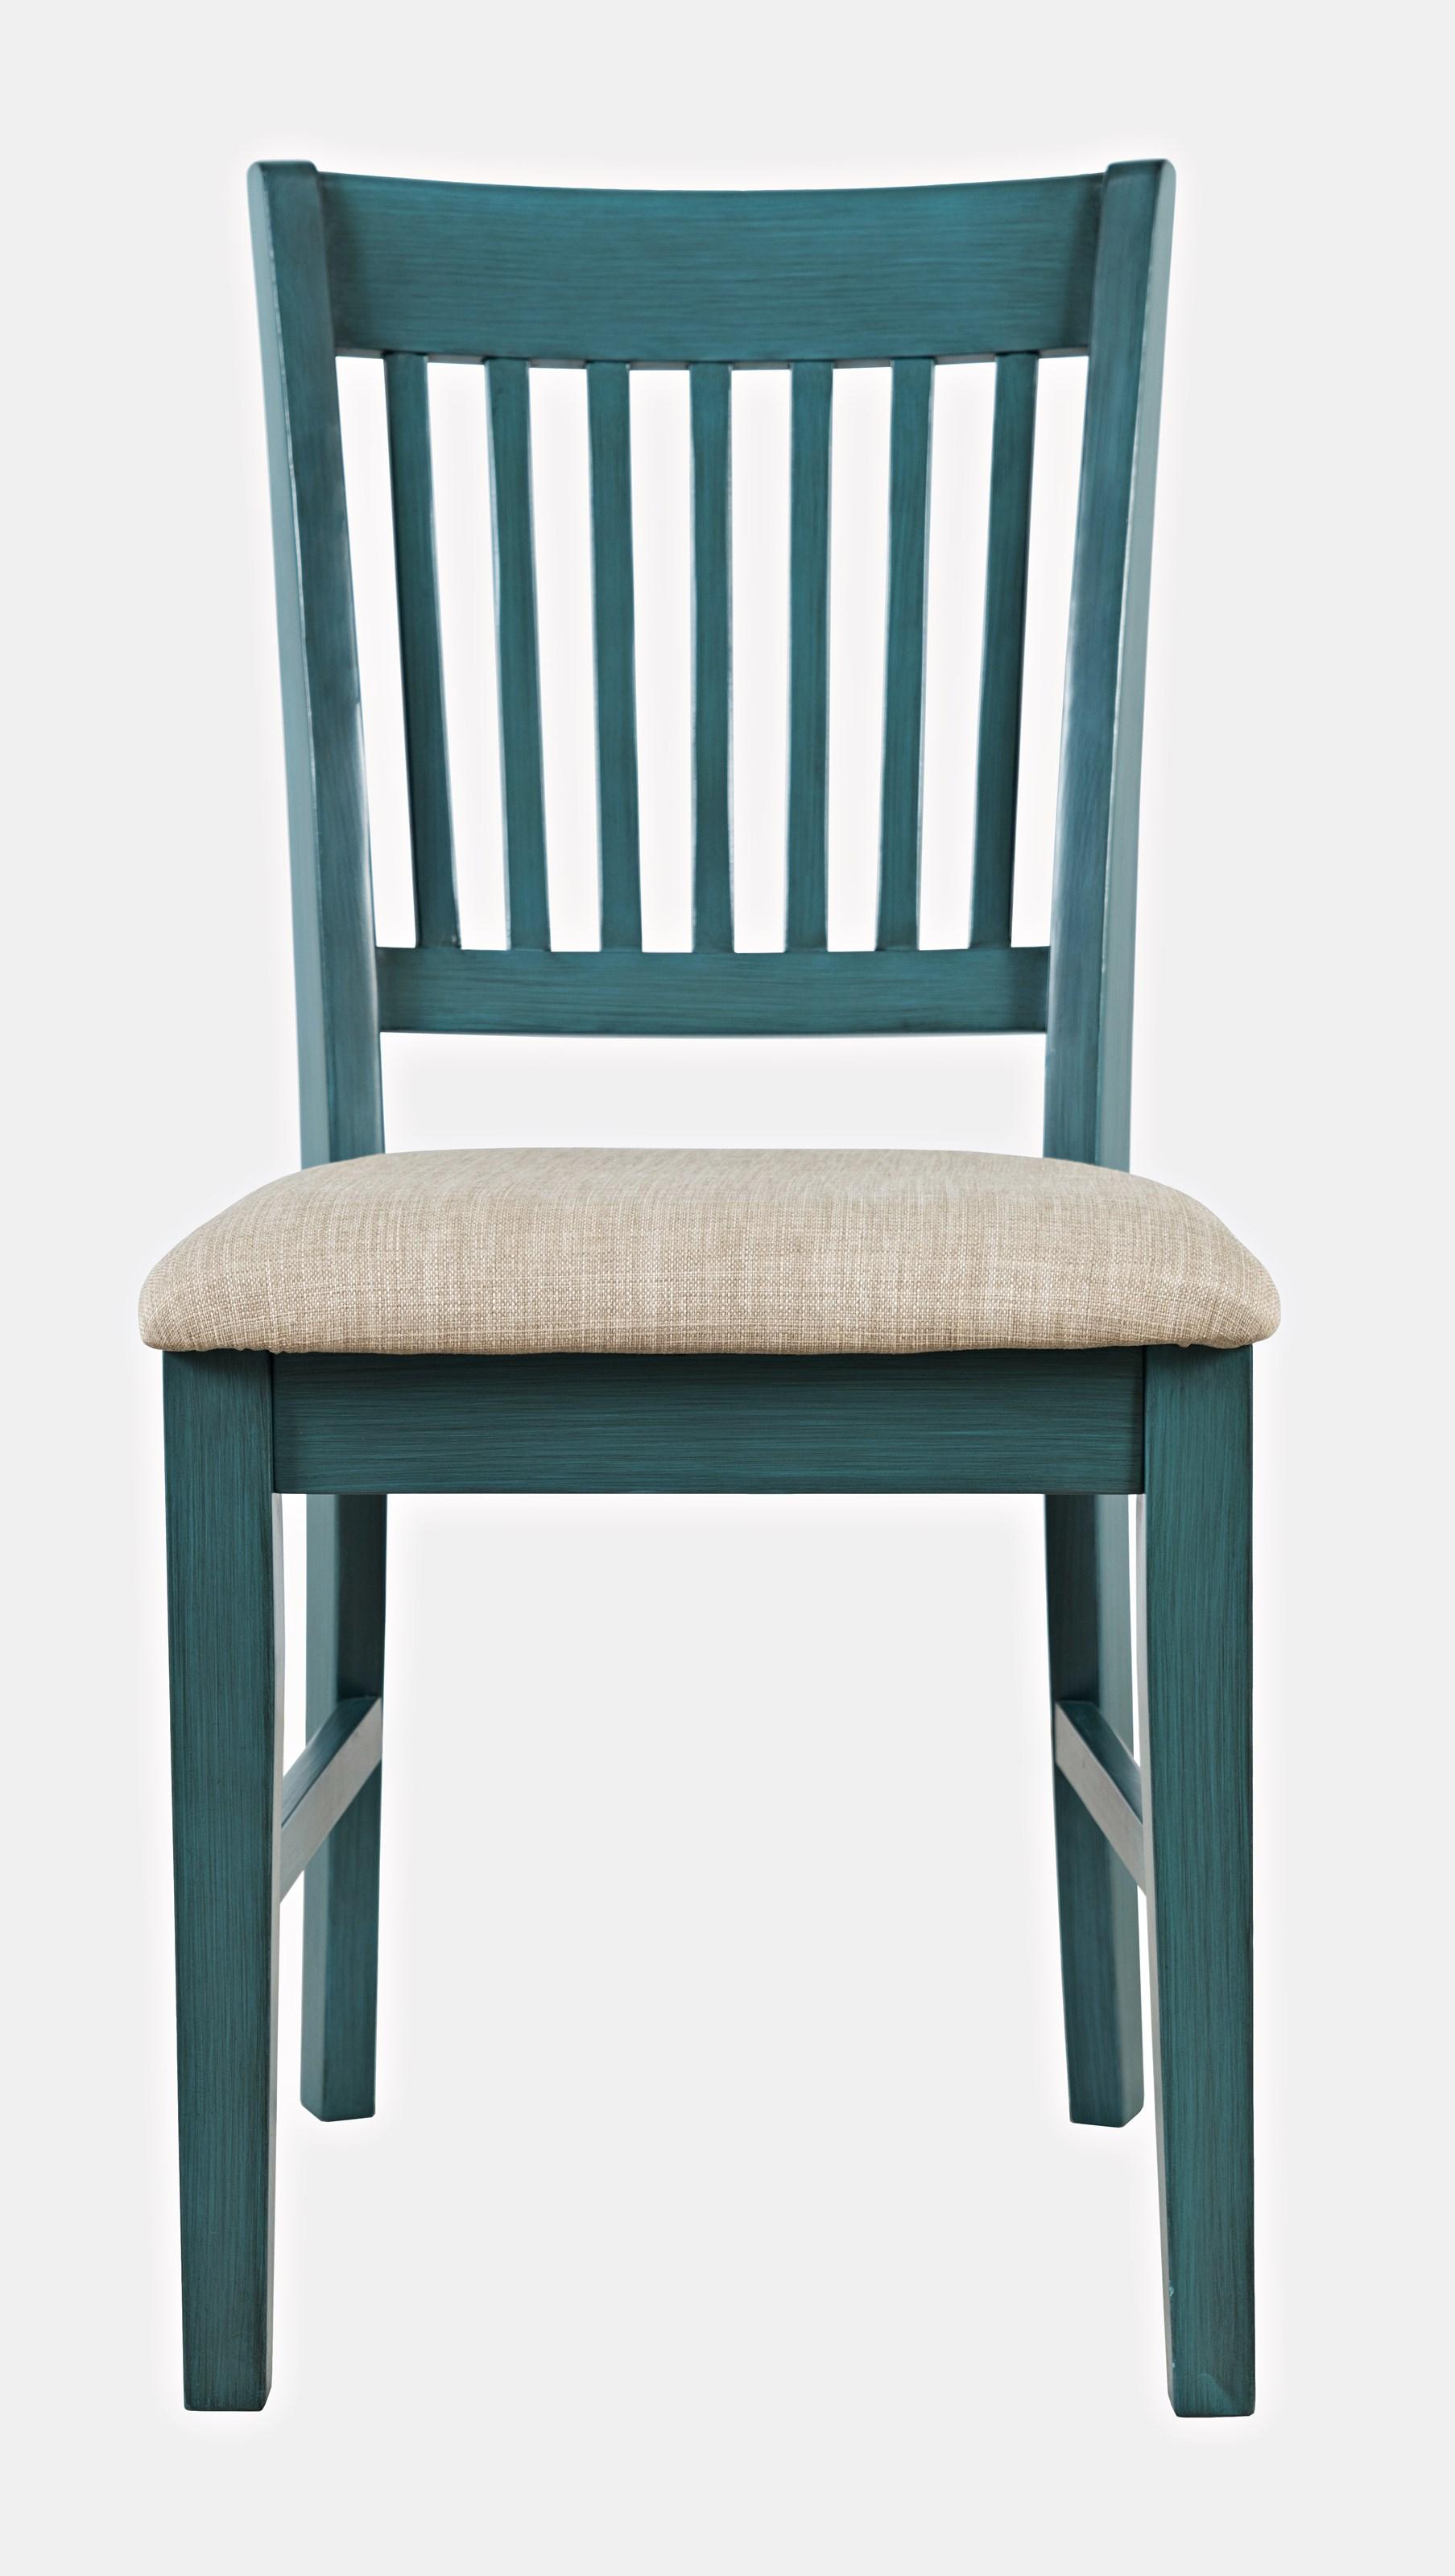 Craftsman Desk Chair by Jofran at Stoney Creek Furniture